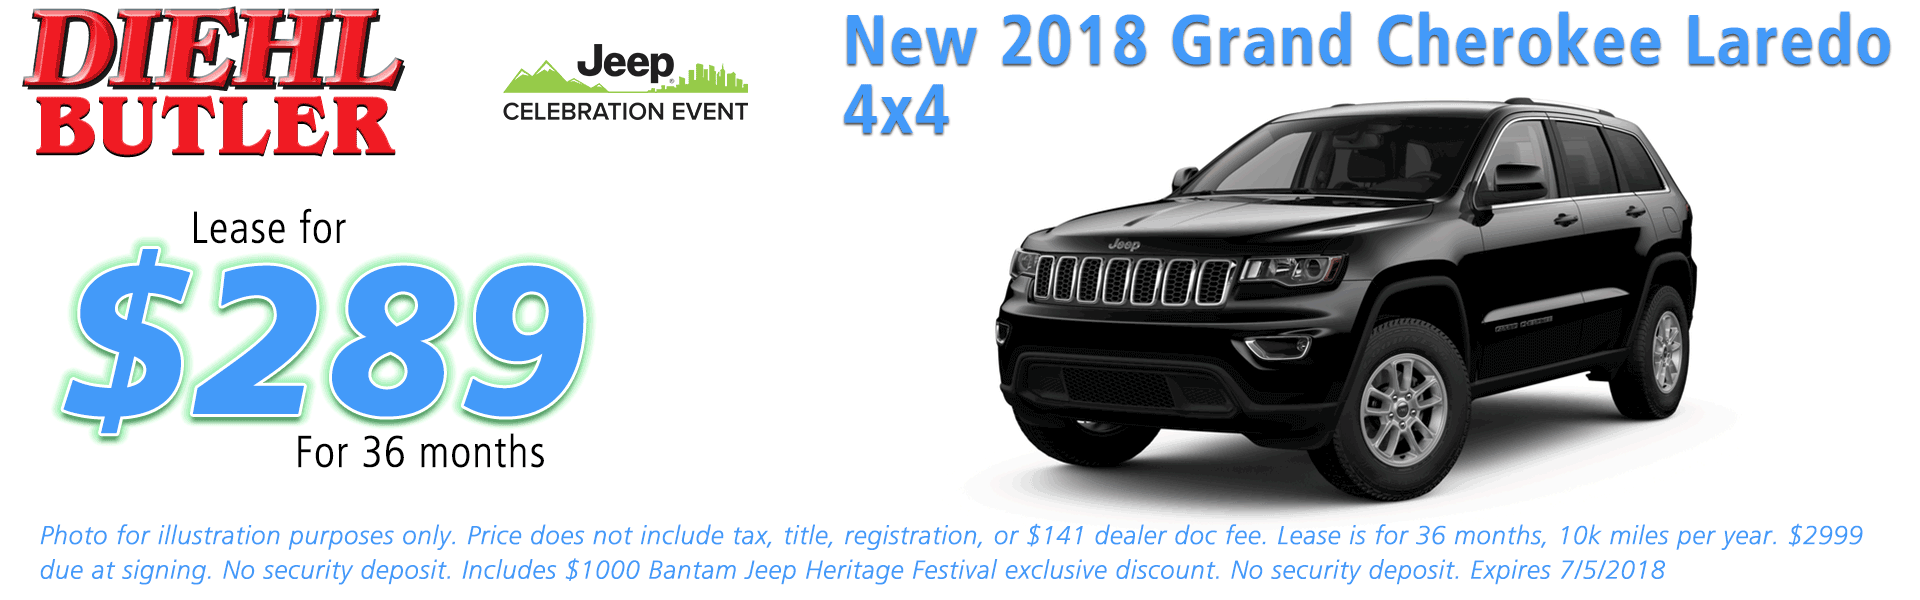 NEW 2018 JEEP GRAND CHEROKEE LAREDO E 4X4 Diehl of Butler, Pennsylvania. Chrysler Jeep Dodge Ram Toyota Volkswagen dealership